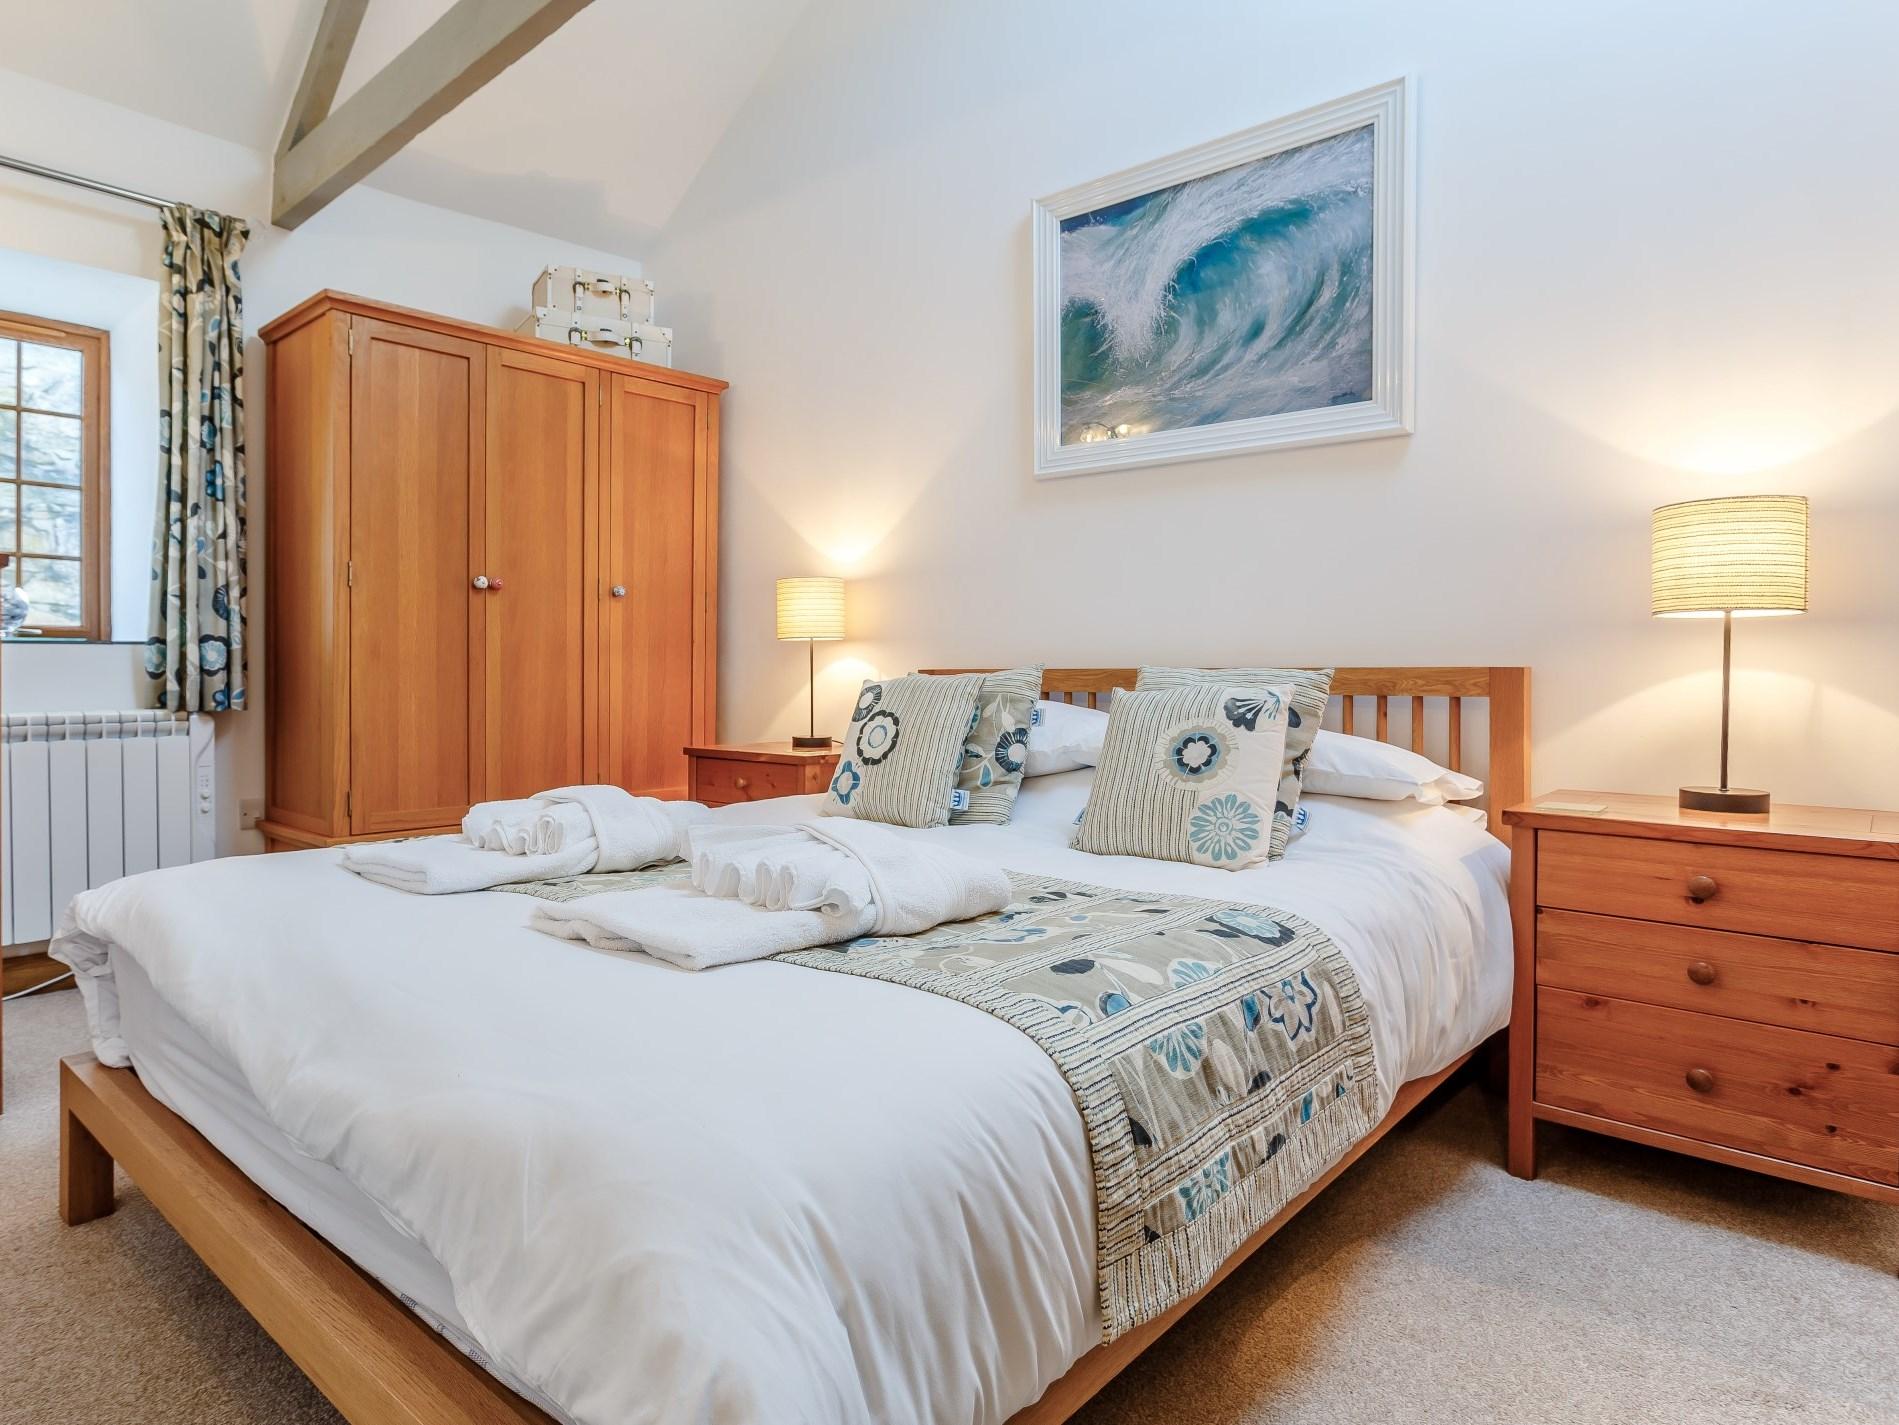 2 Bedroom Barn in West Cornwall, Cornwall